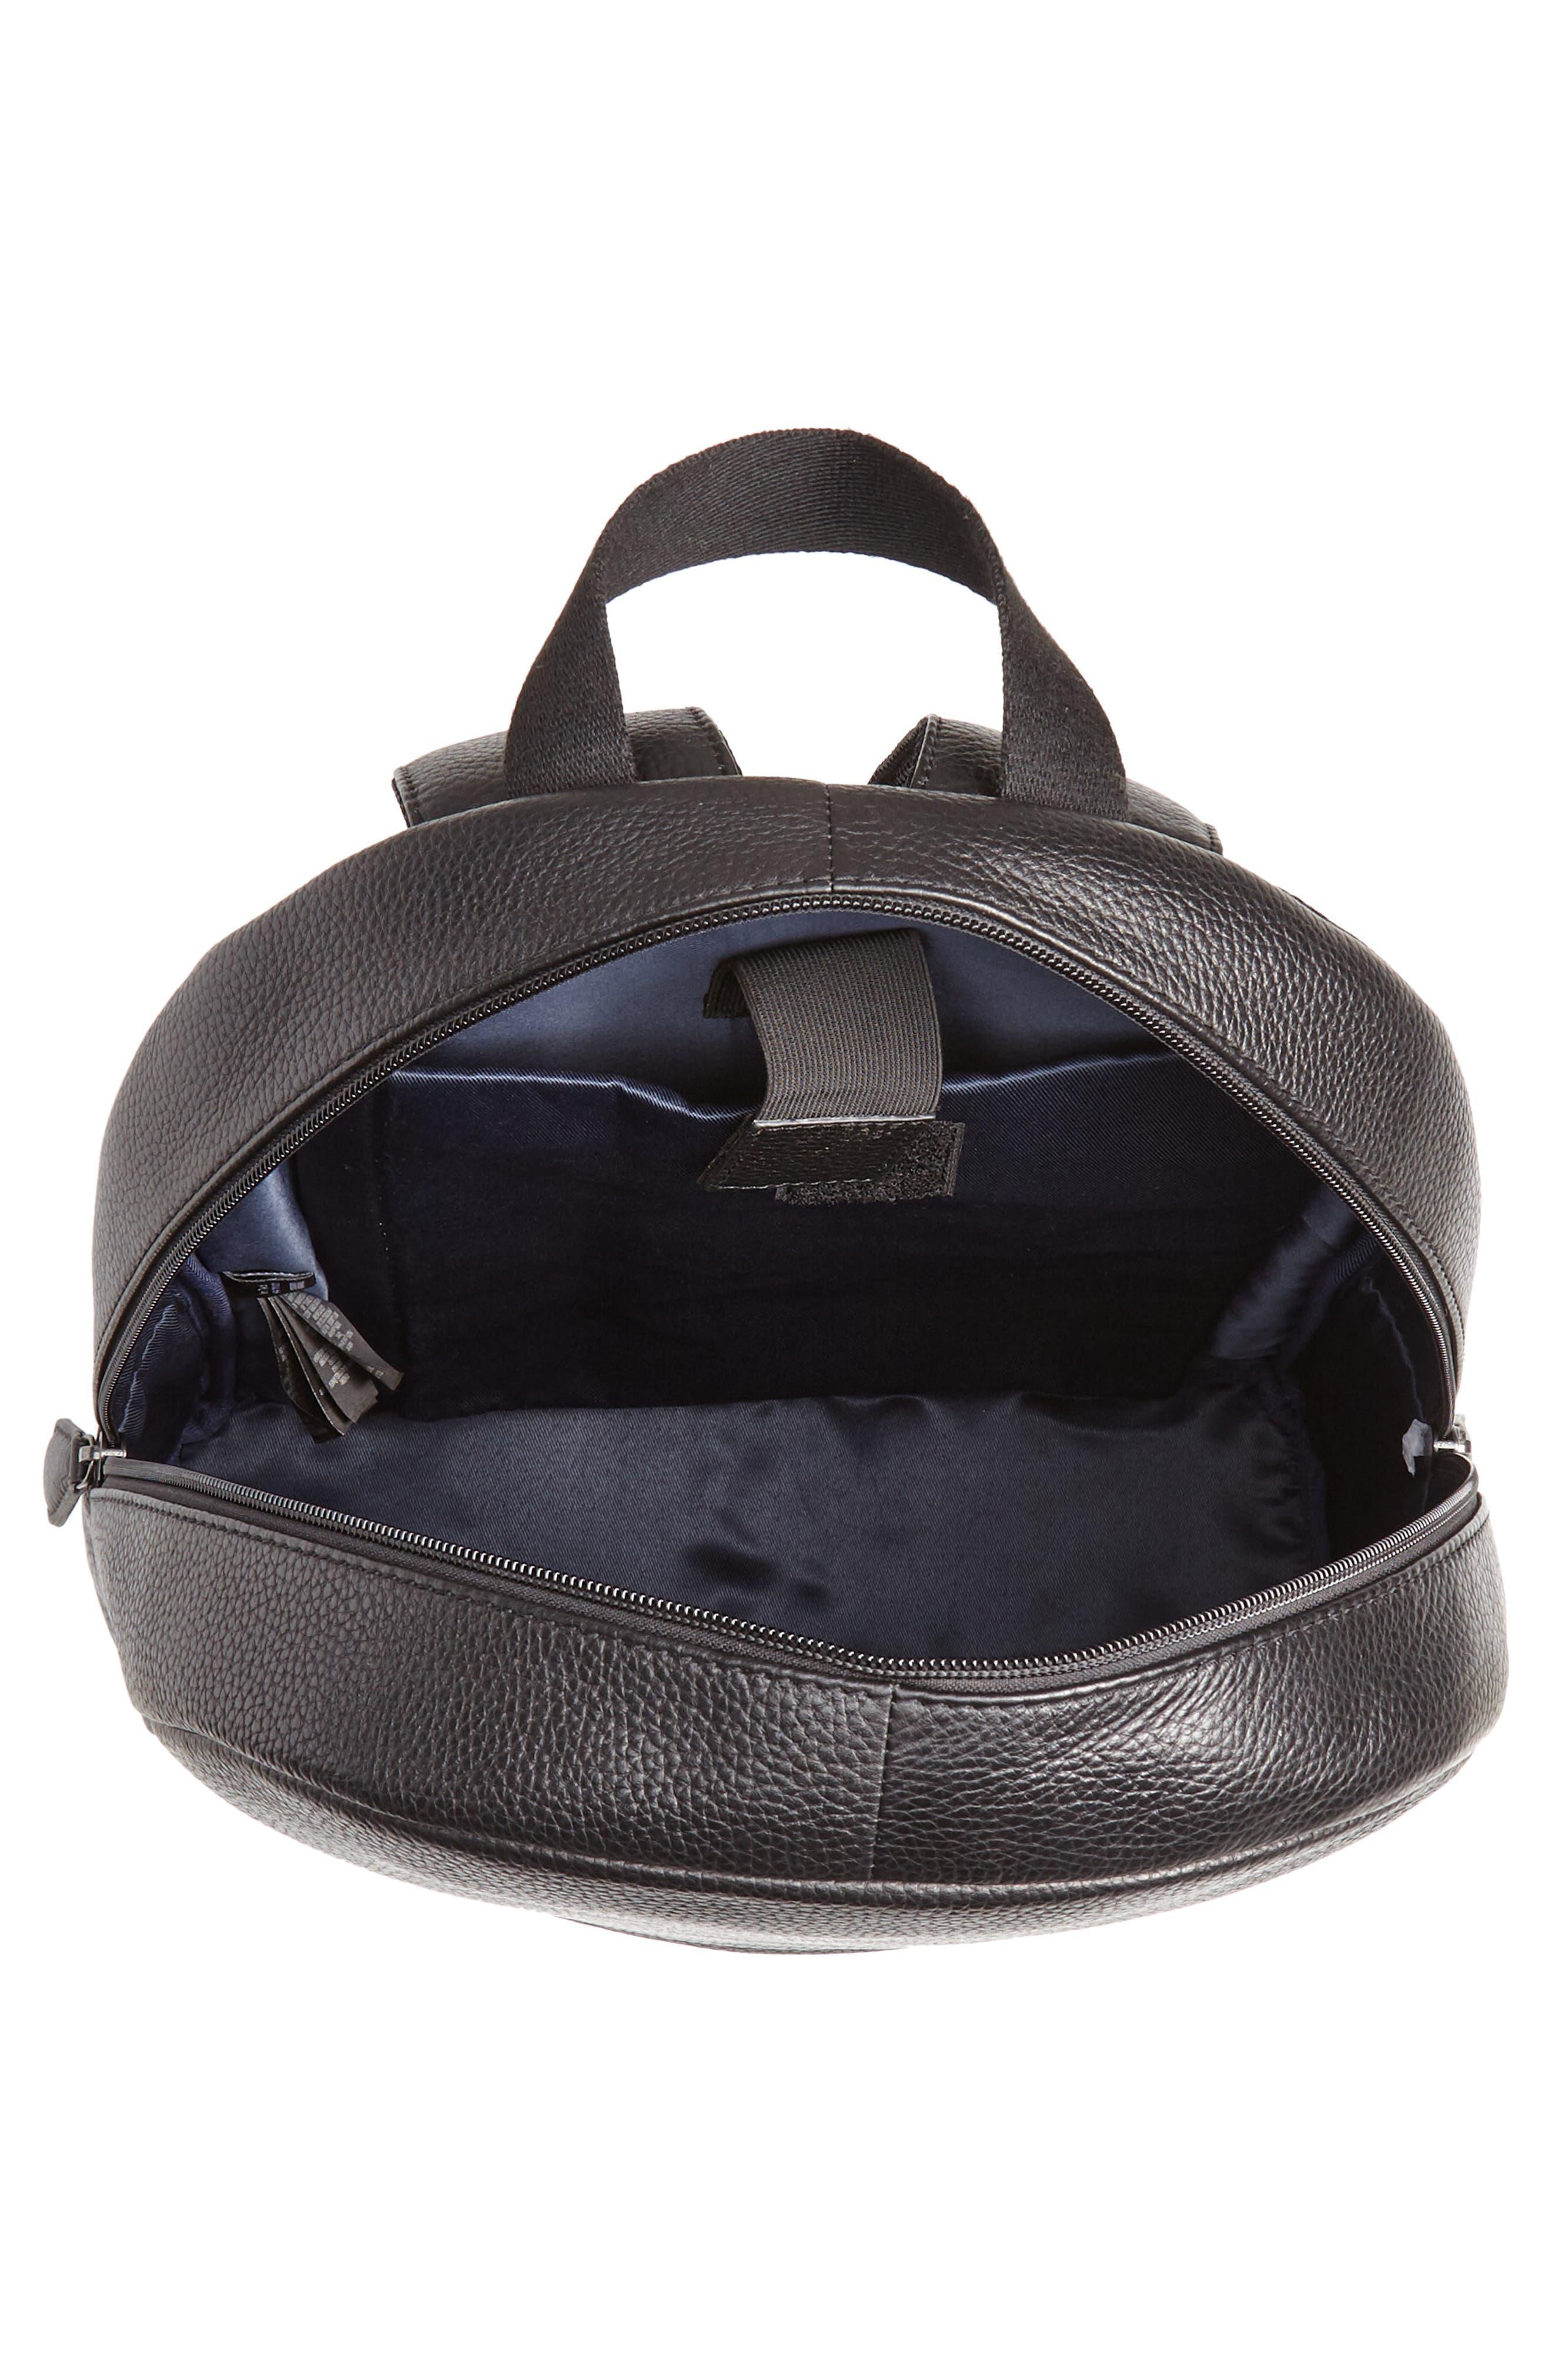 Rickrak Leather Backpack,                             Alternate thumbnail 4, color,                             BLACK